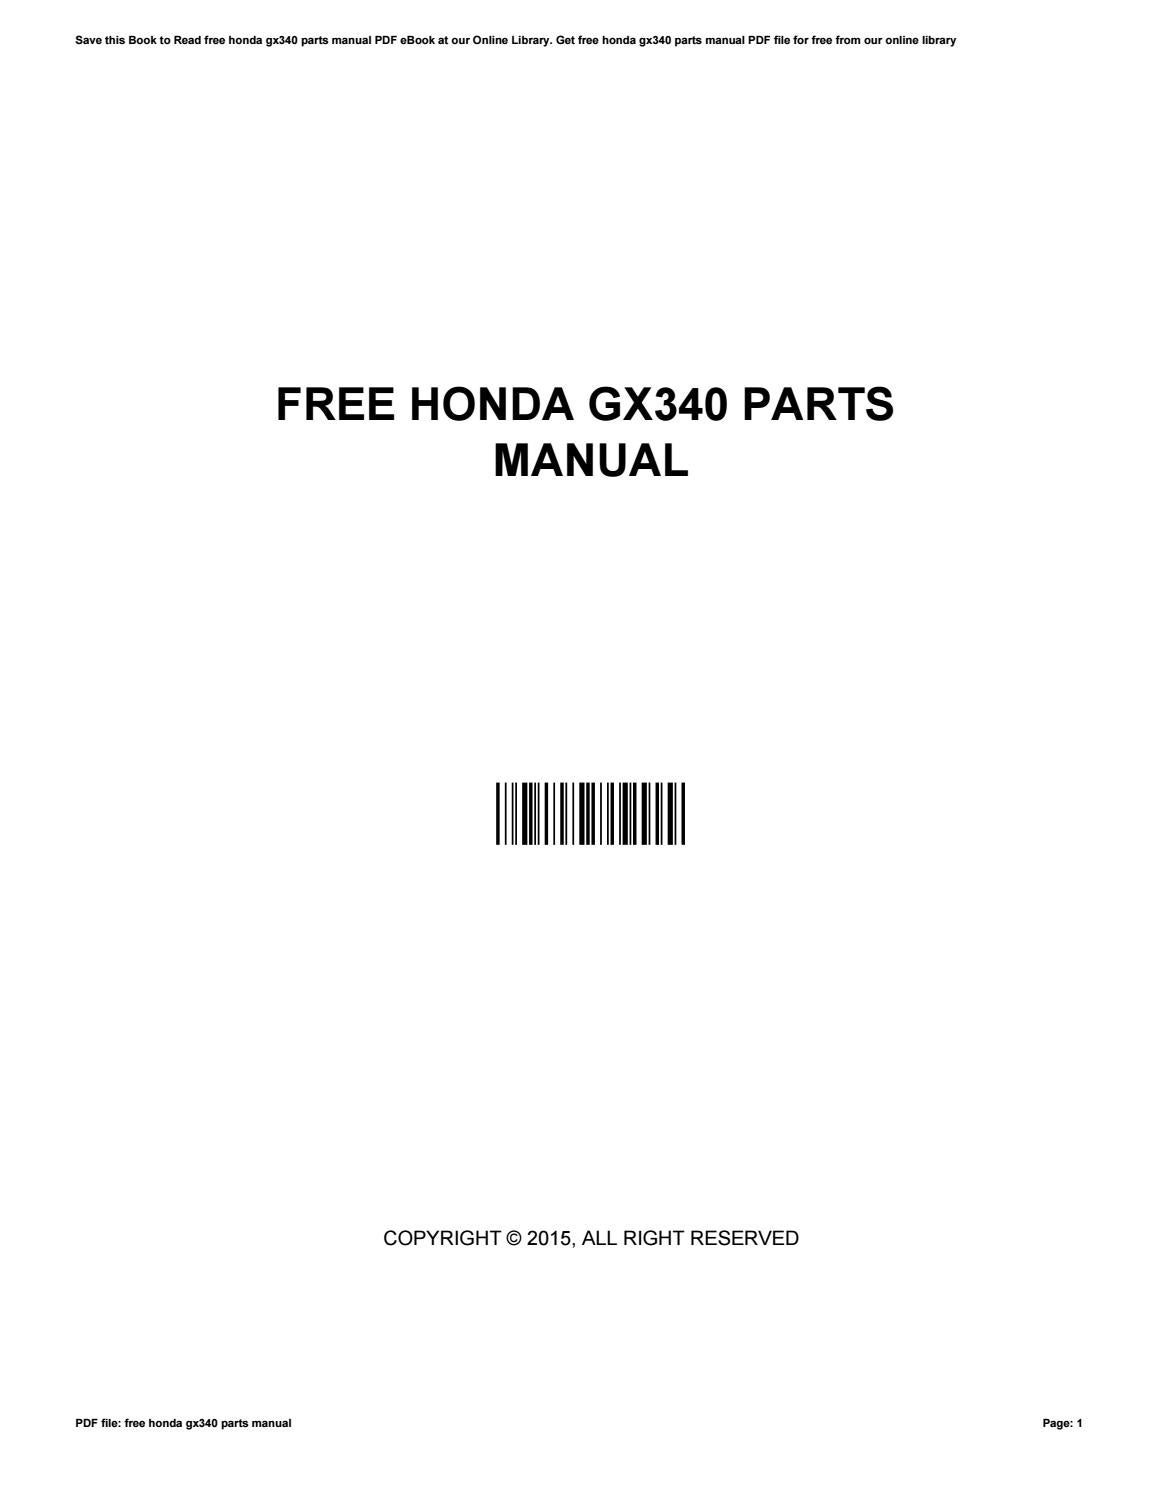 honda gx340 parts manual